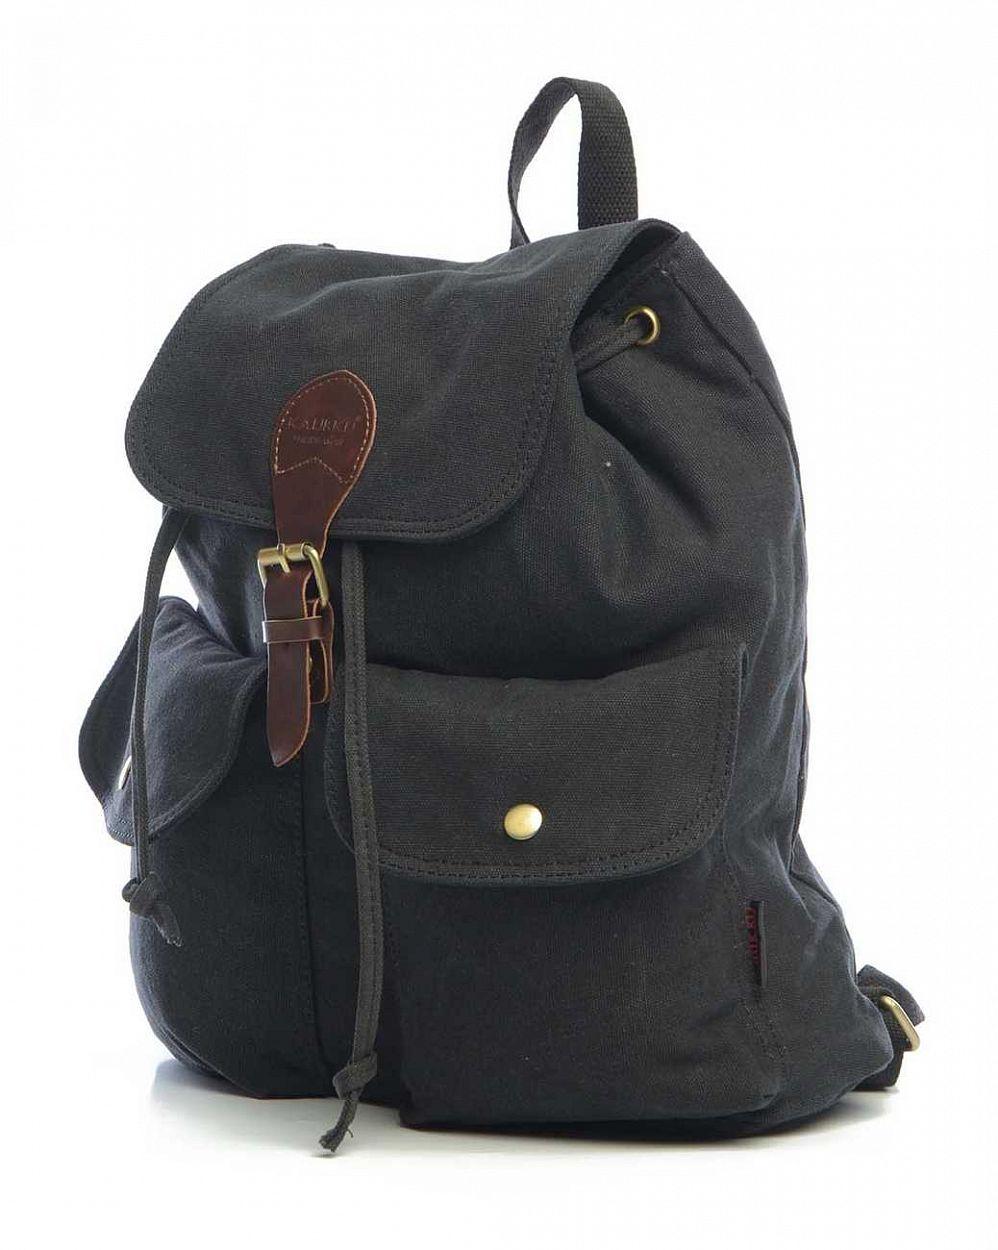 700e8fbae1f2 Рюкзак женский городской Kaukko Authentic Bags Co.Ltd FJ17 Black отзывы; 2  ...